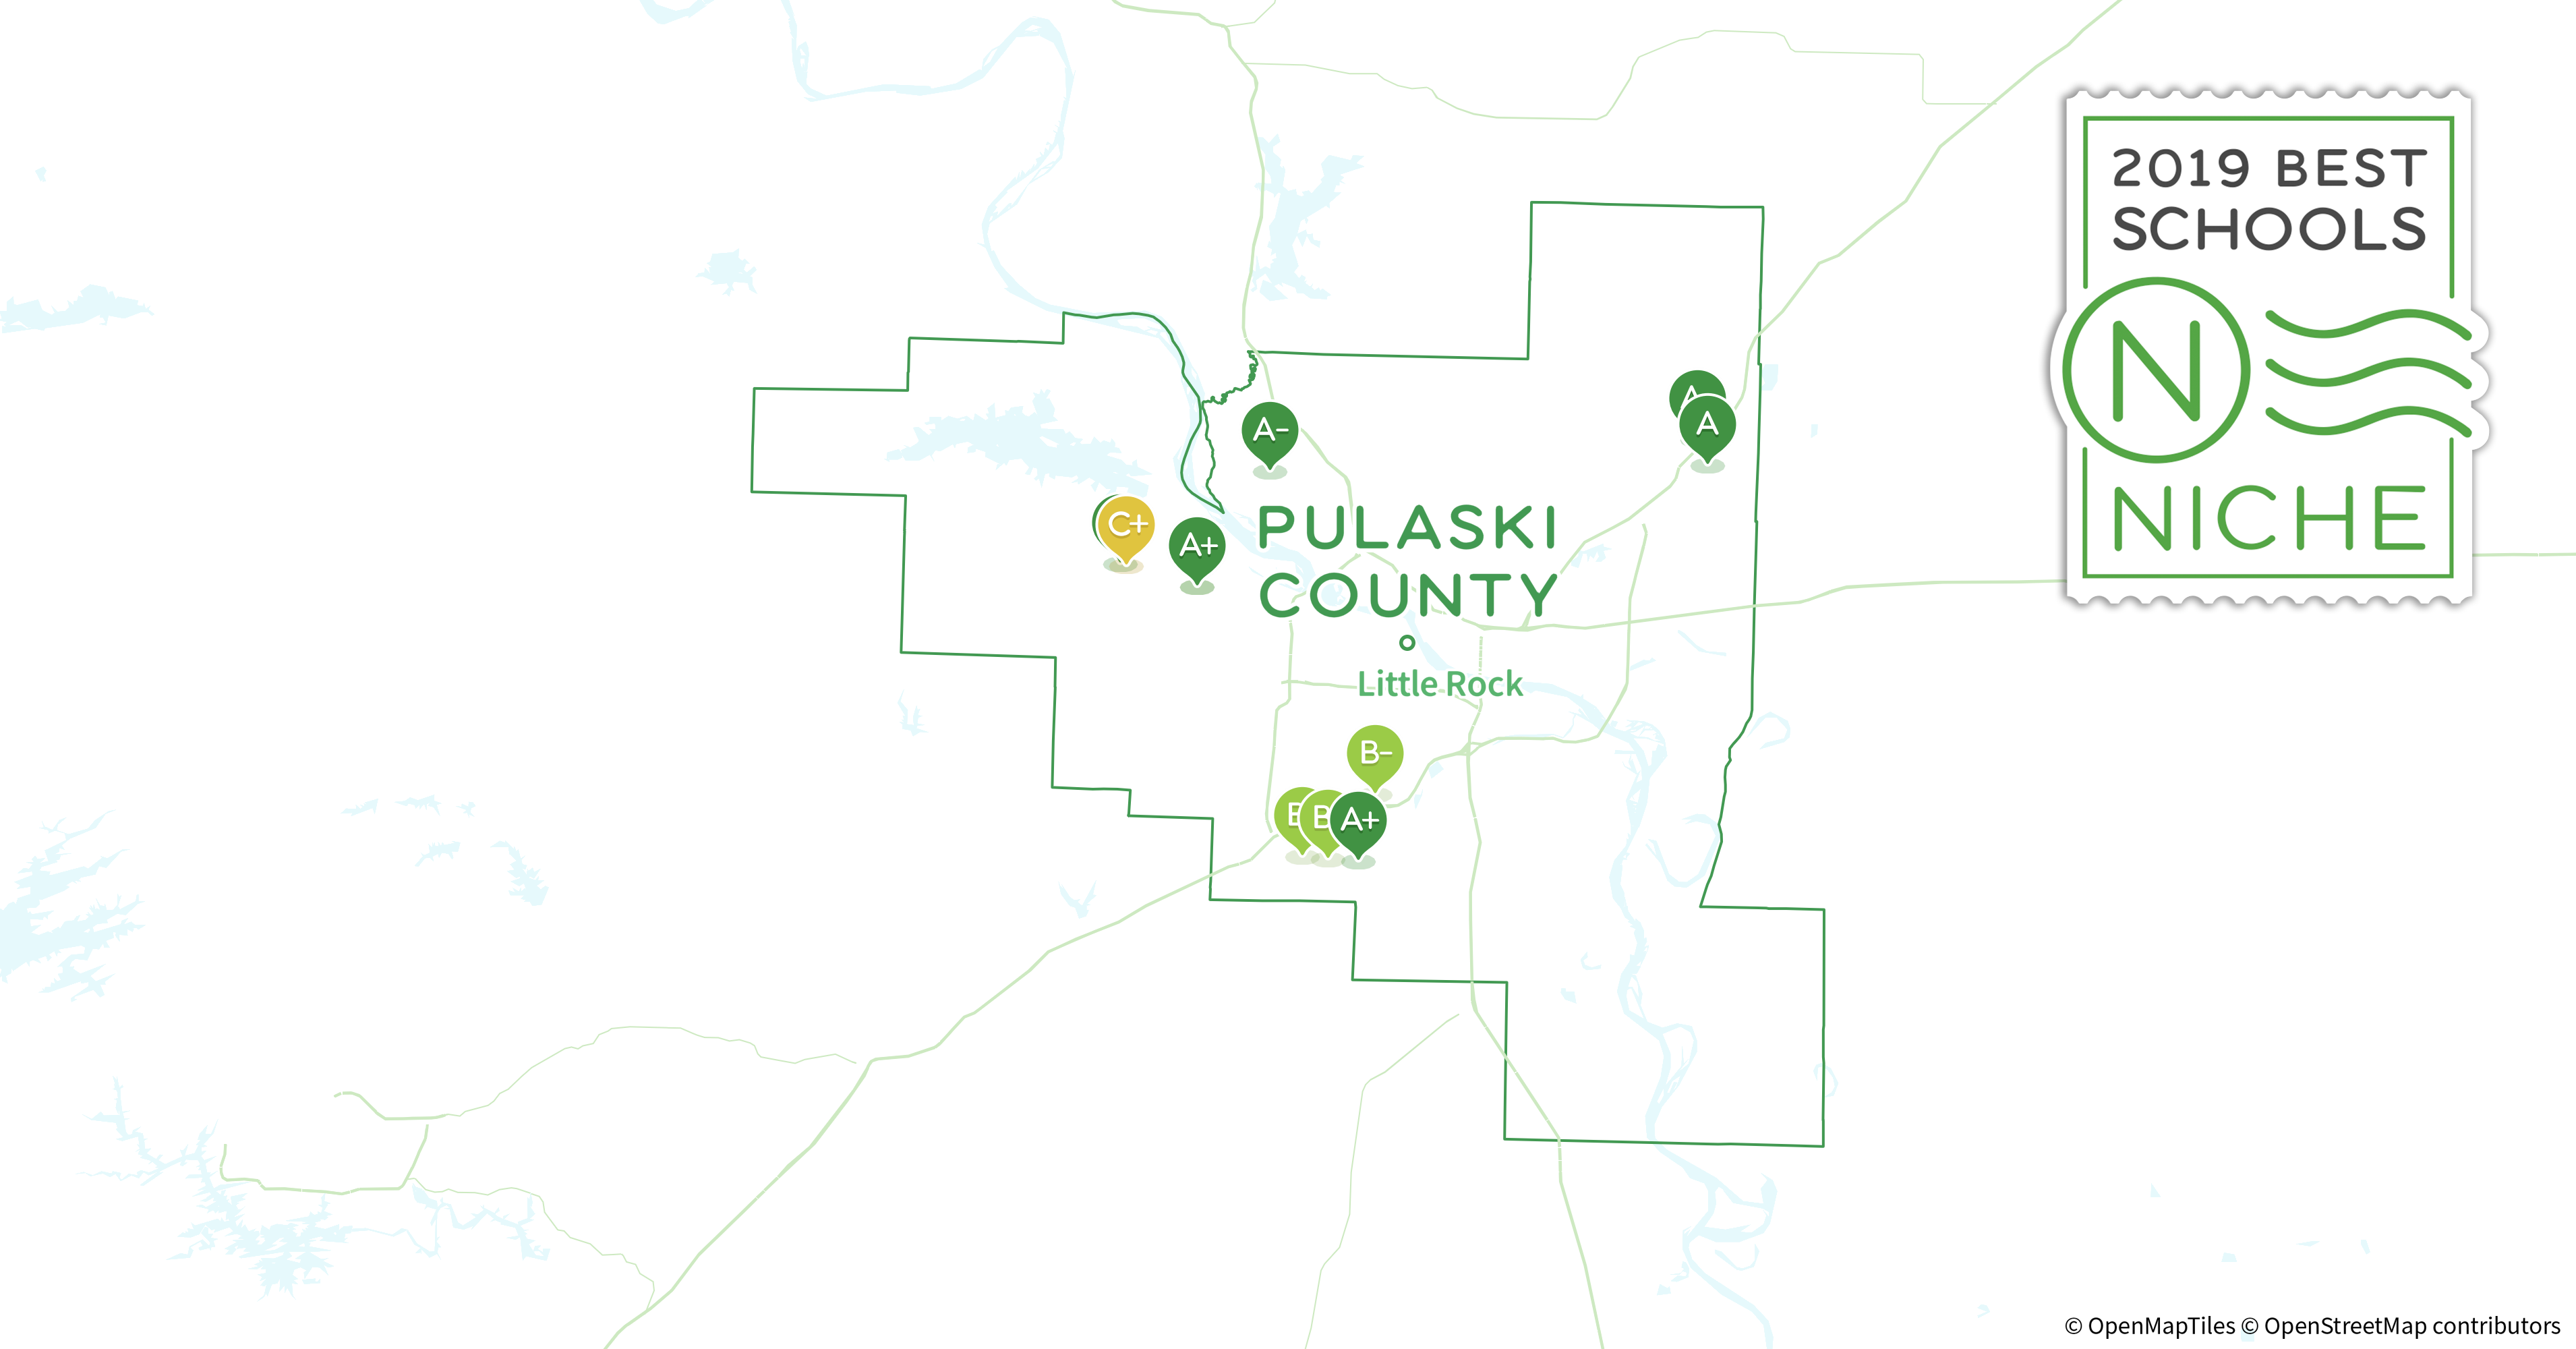 School Districts In Pulaski County Ar Niche